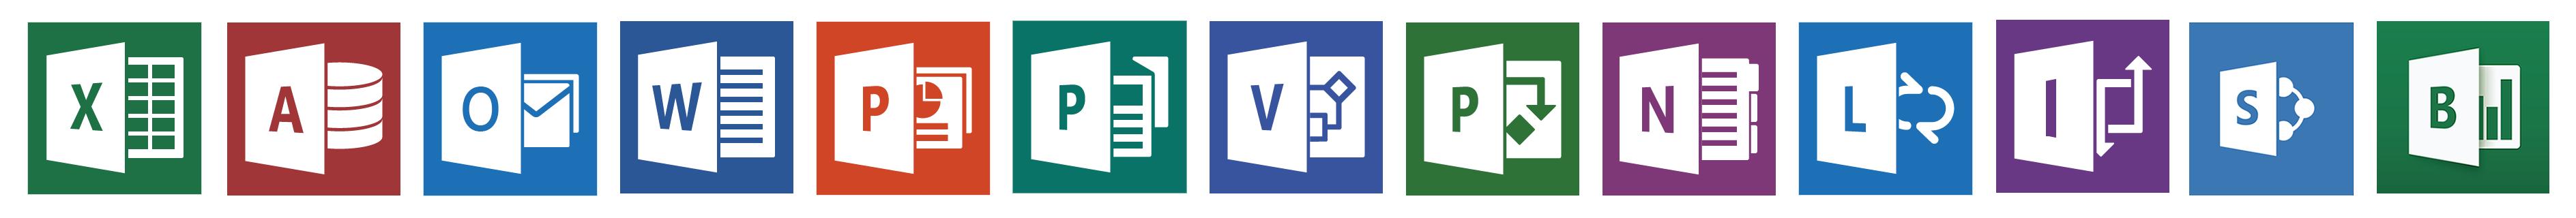 Logos of Microsoft applications we work in.